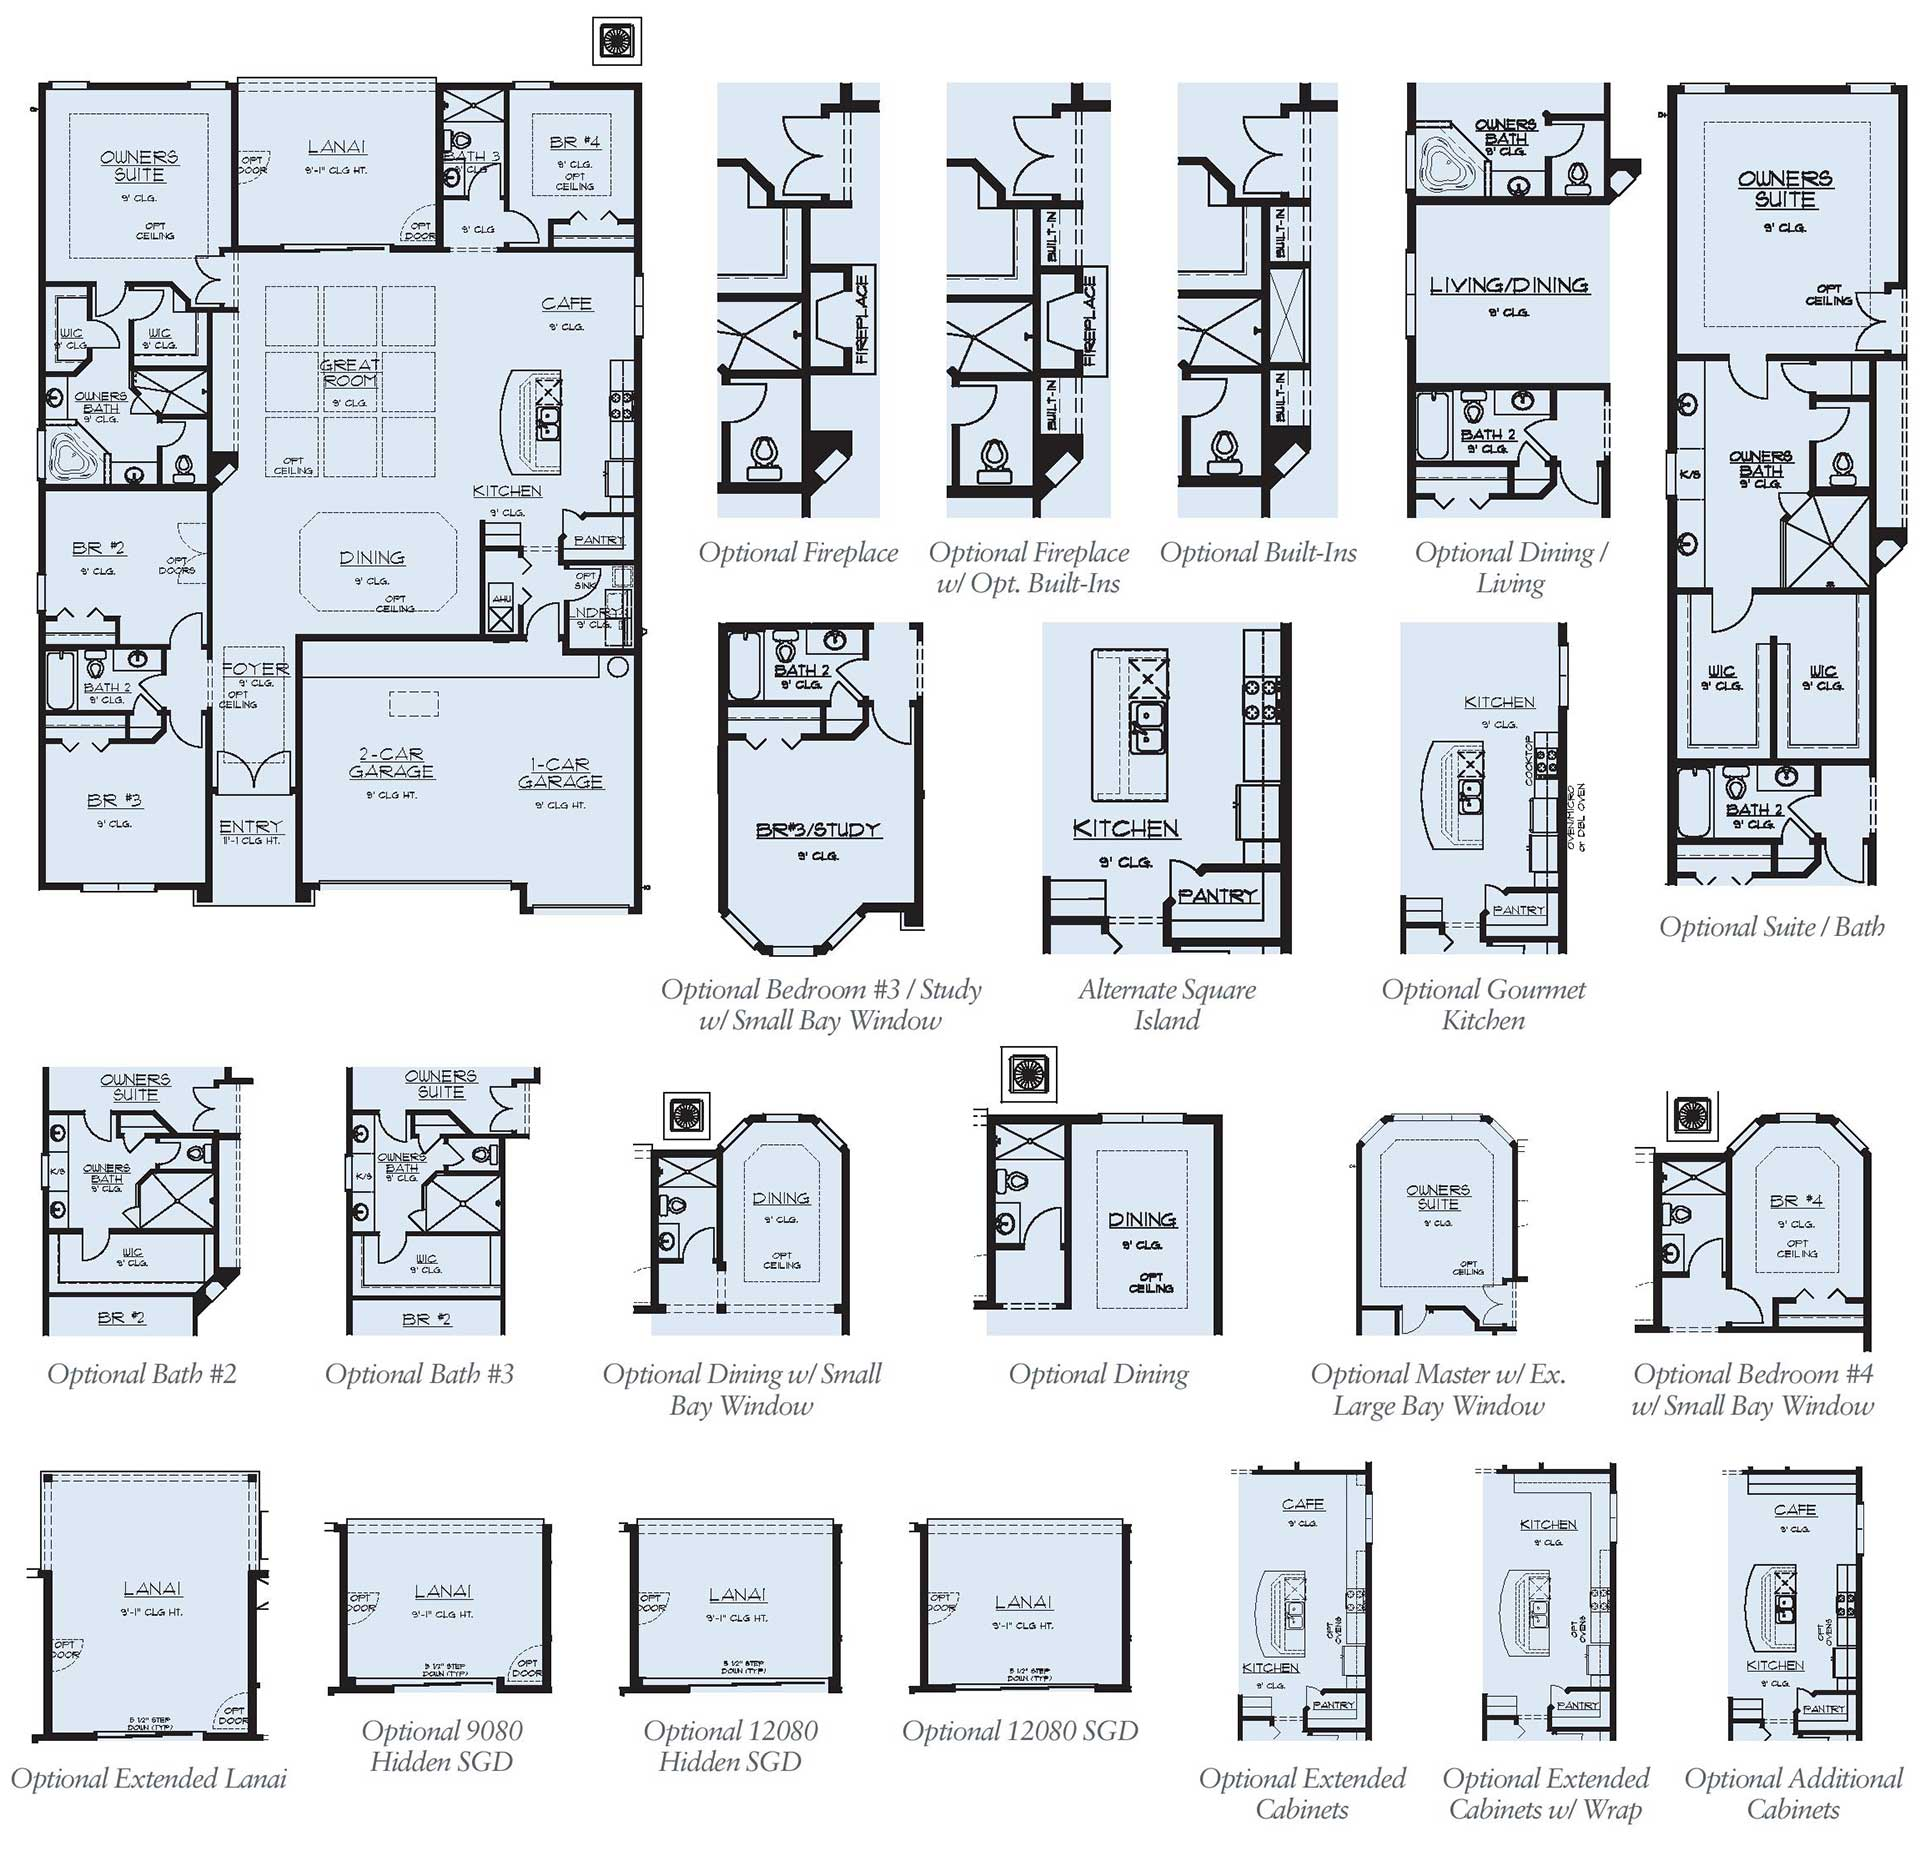 Dream finder homes floorplan avalon I at Tributary